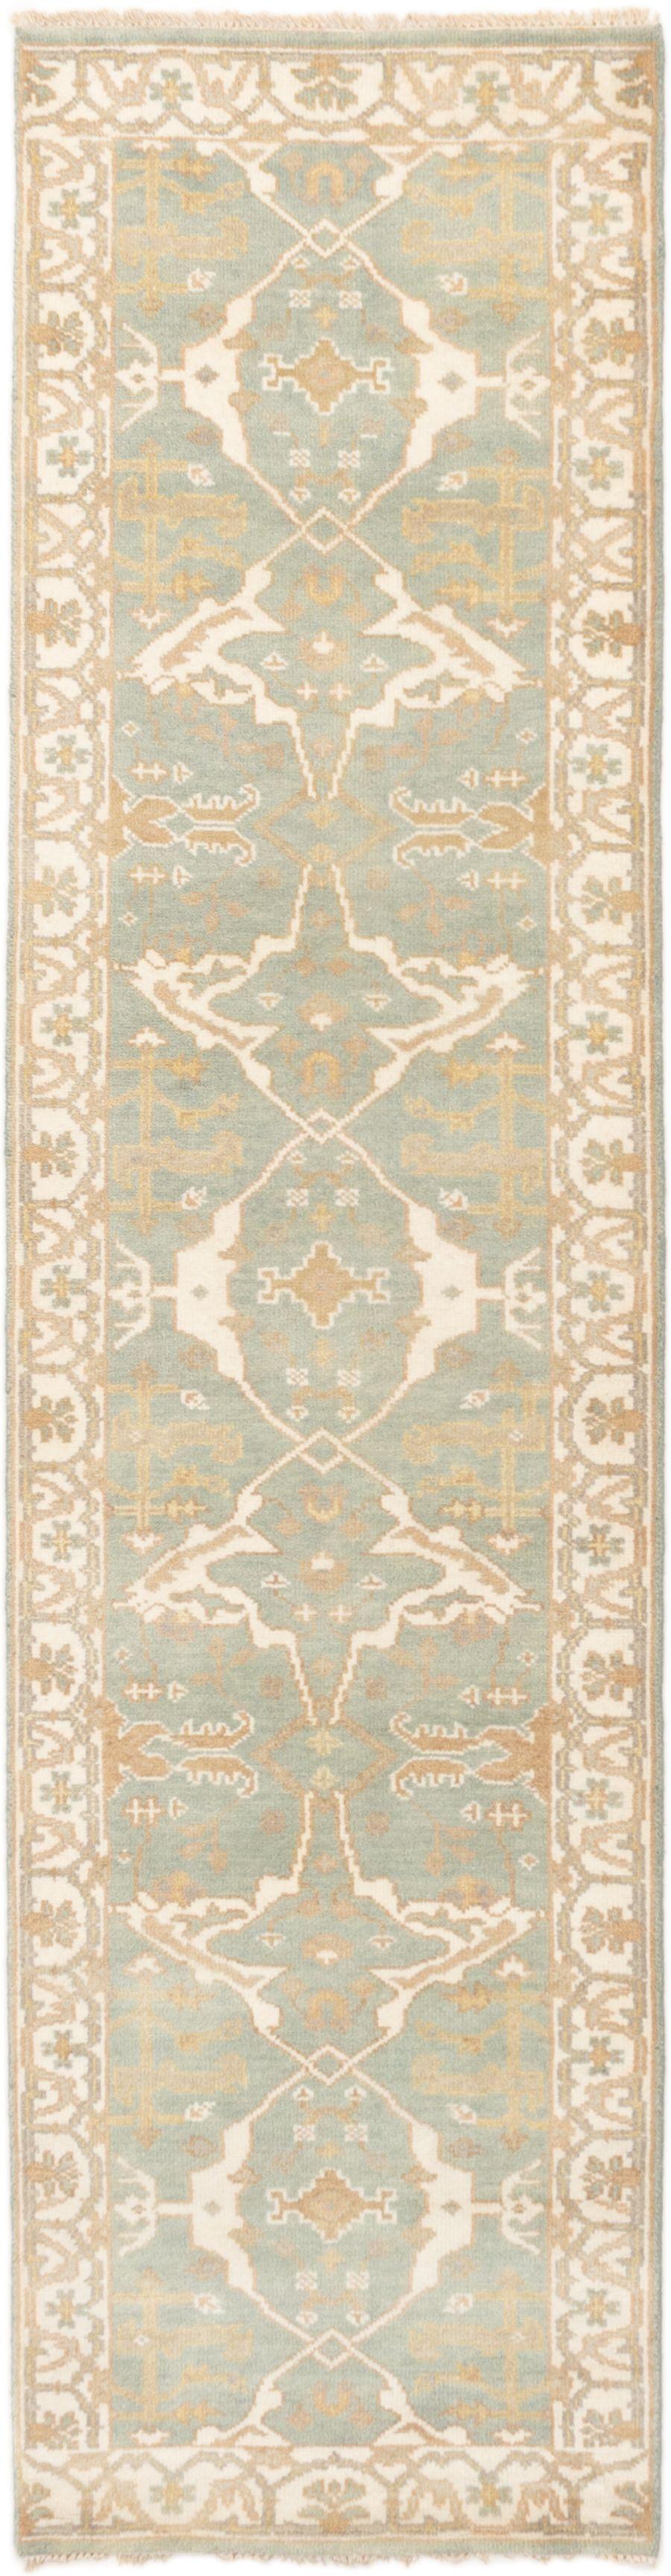 "Hand-knotted Royal Ushak Light Blue  Wool Rug 2'8"" x 10'3"" Size: 2'8"" x 10'3"""